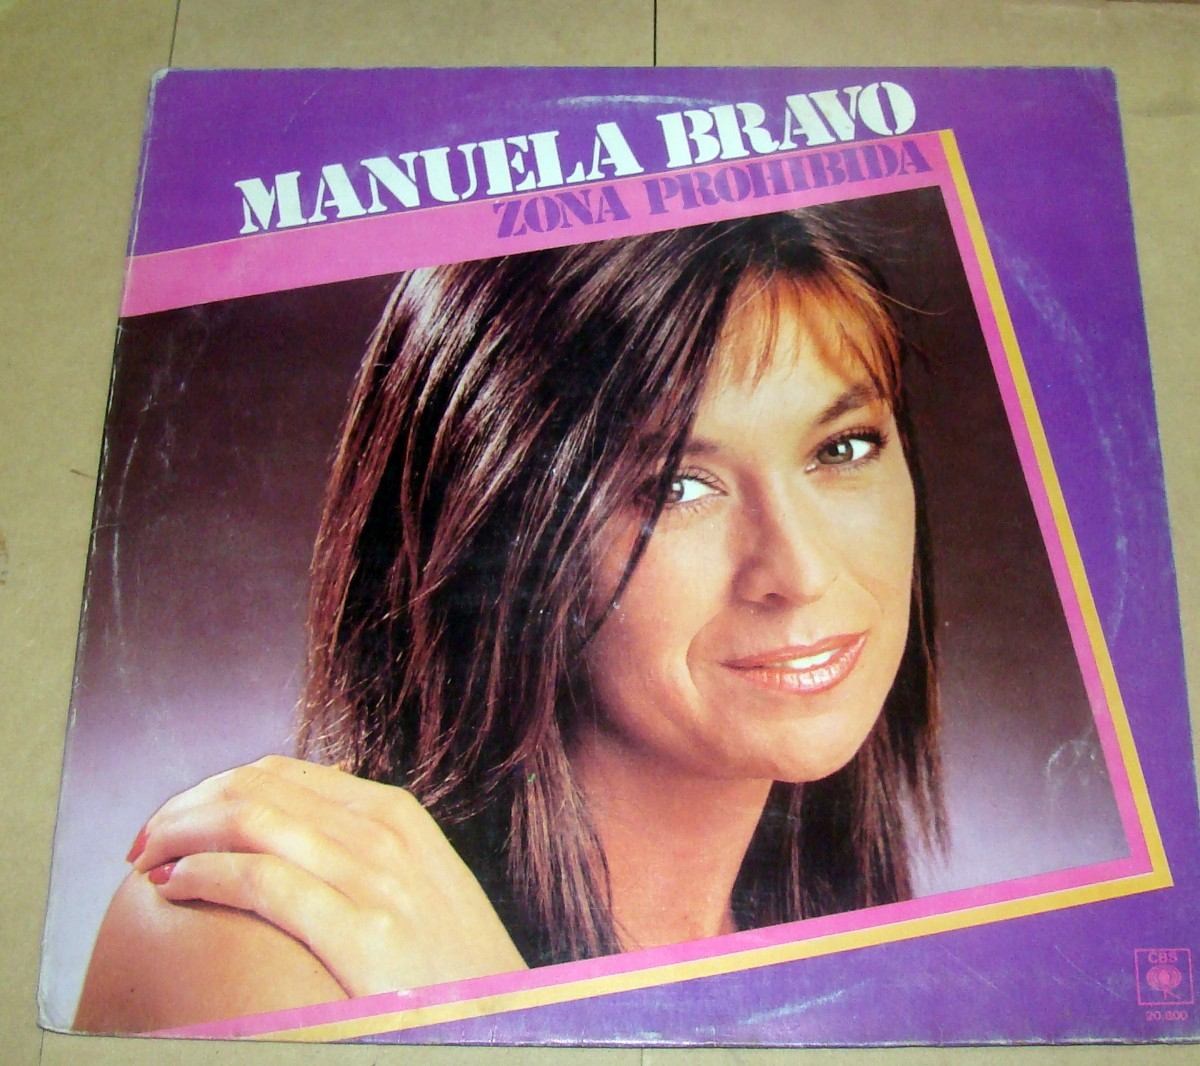 4febb159a25b5 Manuela Bravo Zona Prohibida Vinilo Argentino -   349,60 en Mercado ...